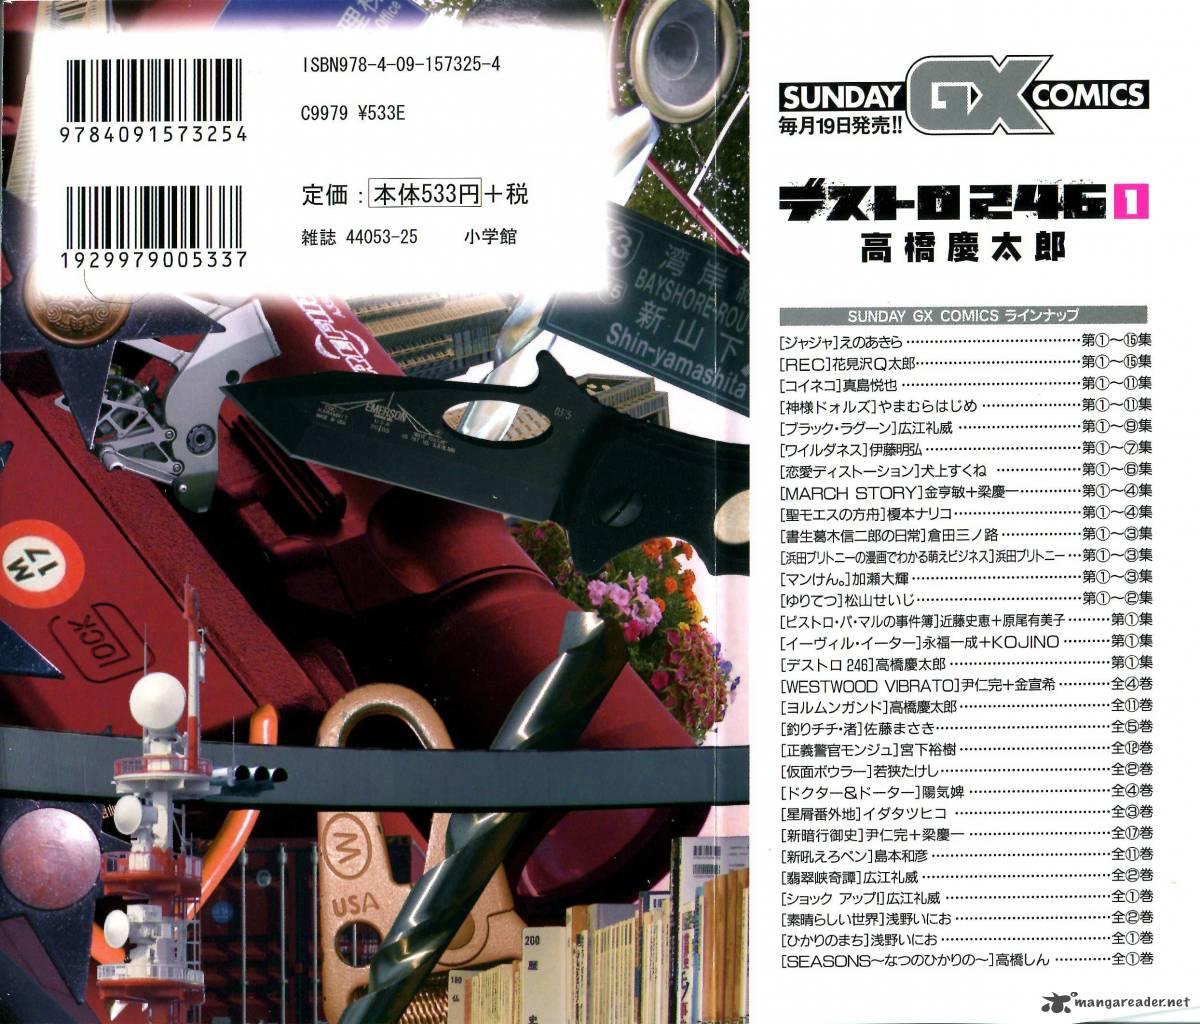 HQ Destro 246 Wallpapers | File 202.74Kb